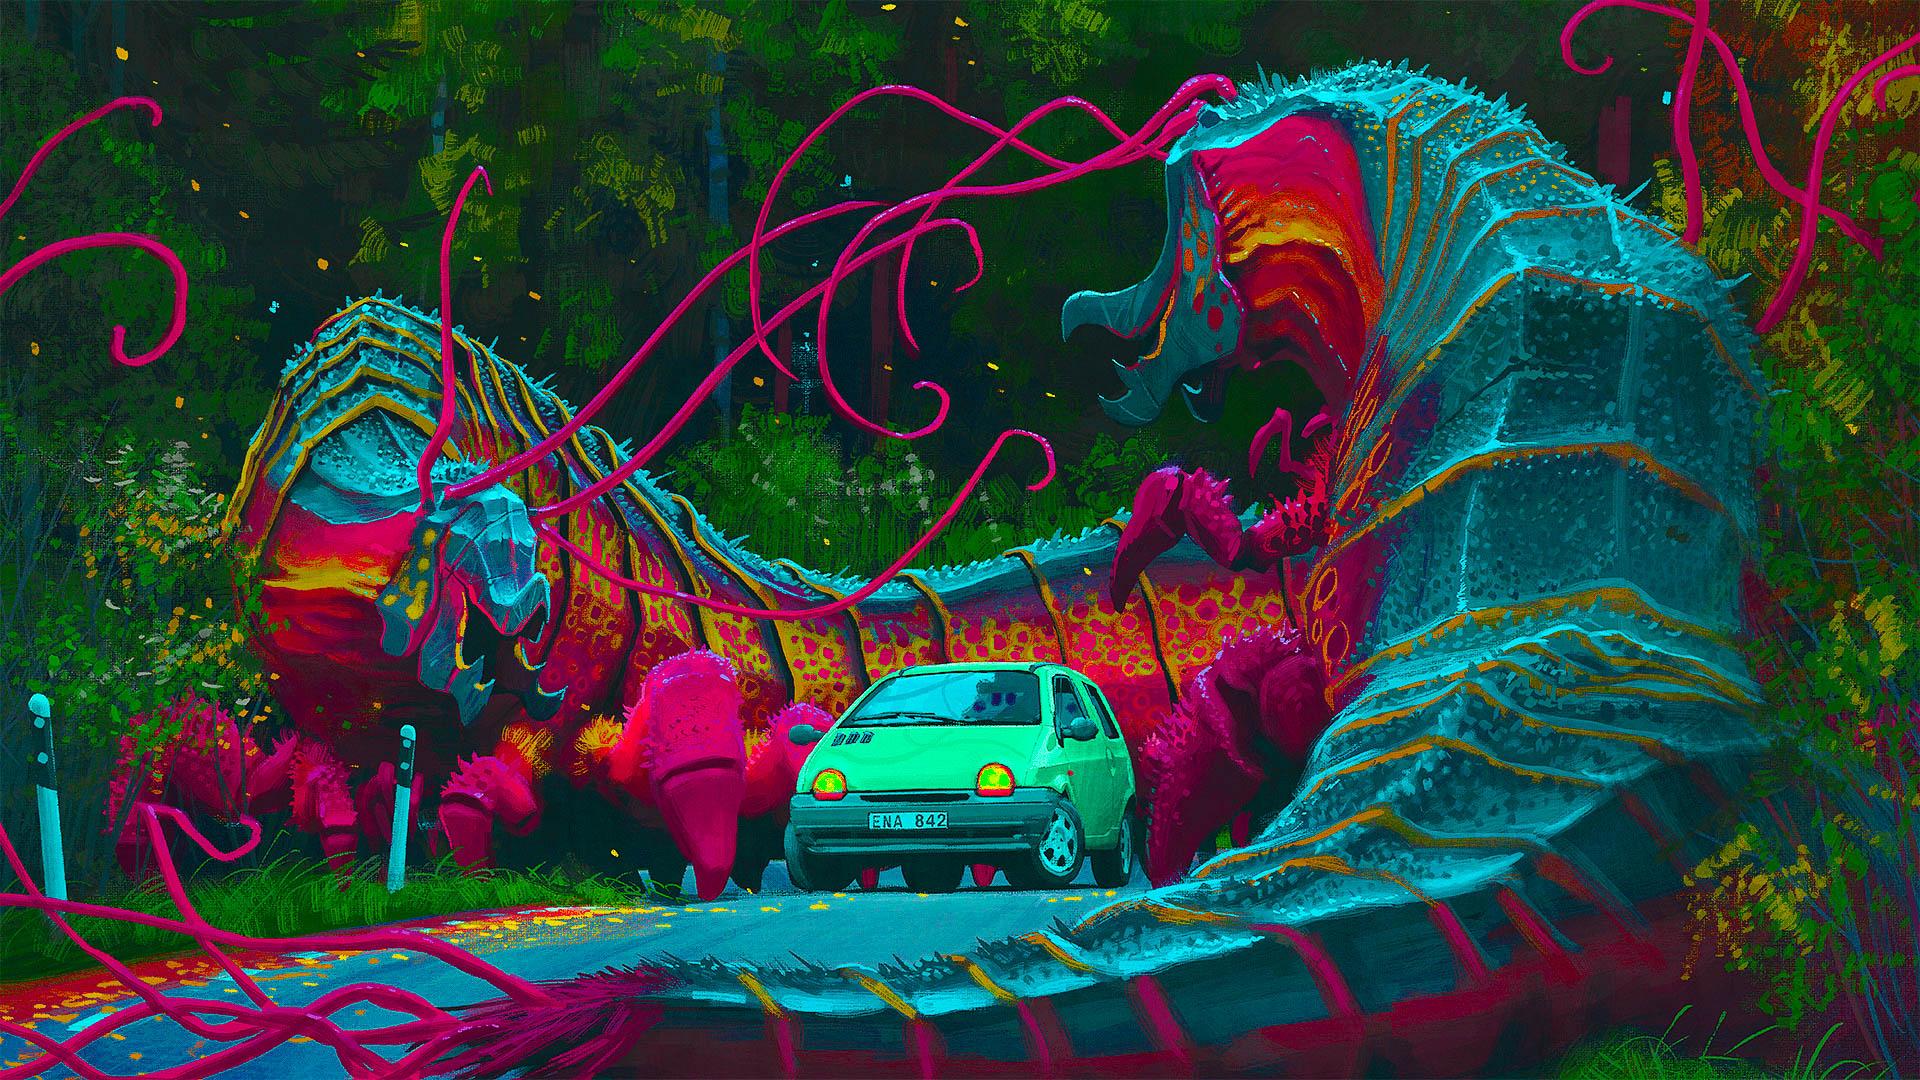 Wallpaper Psychedelic Trippy Colorful Simon Stalenhag 1920x1080